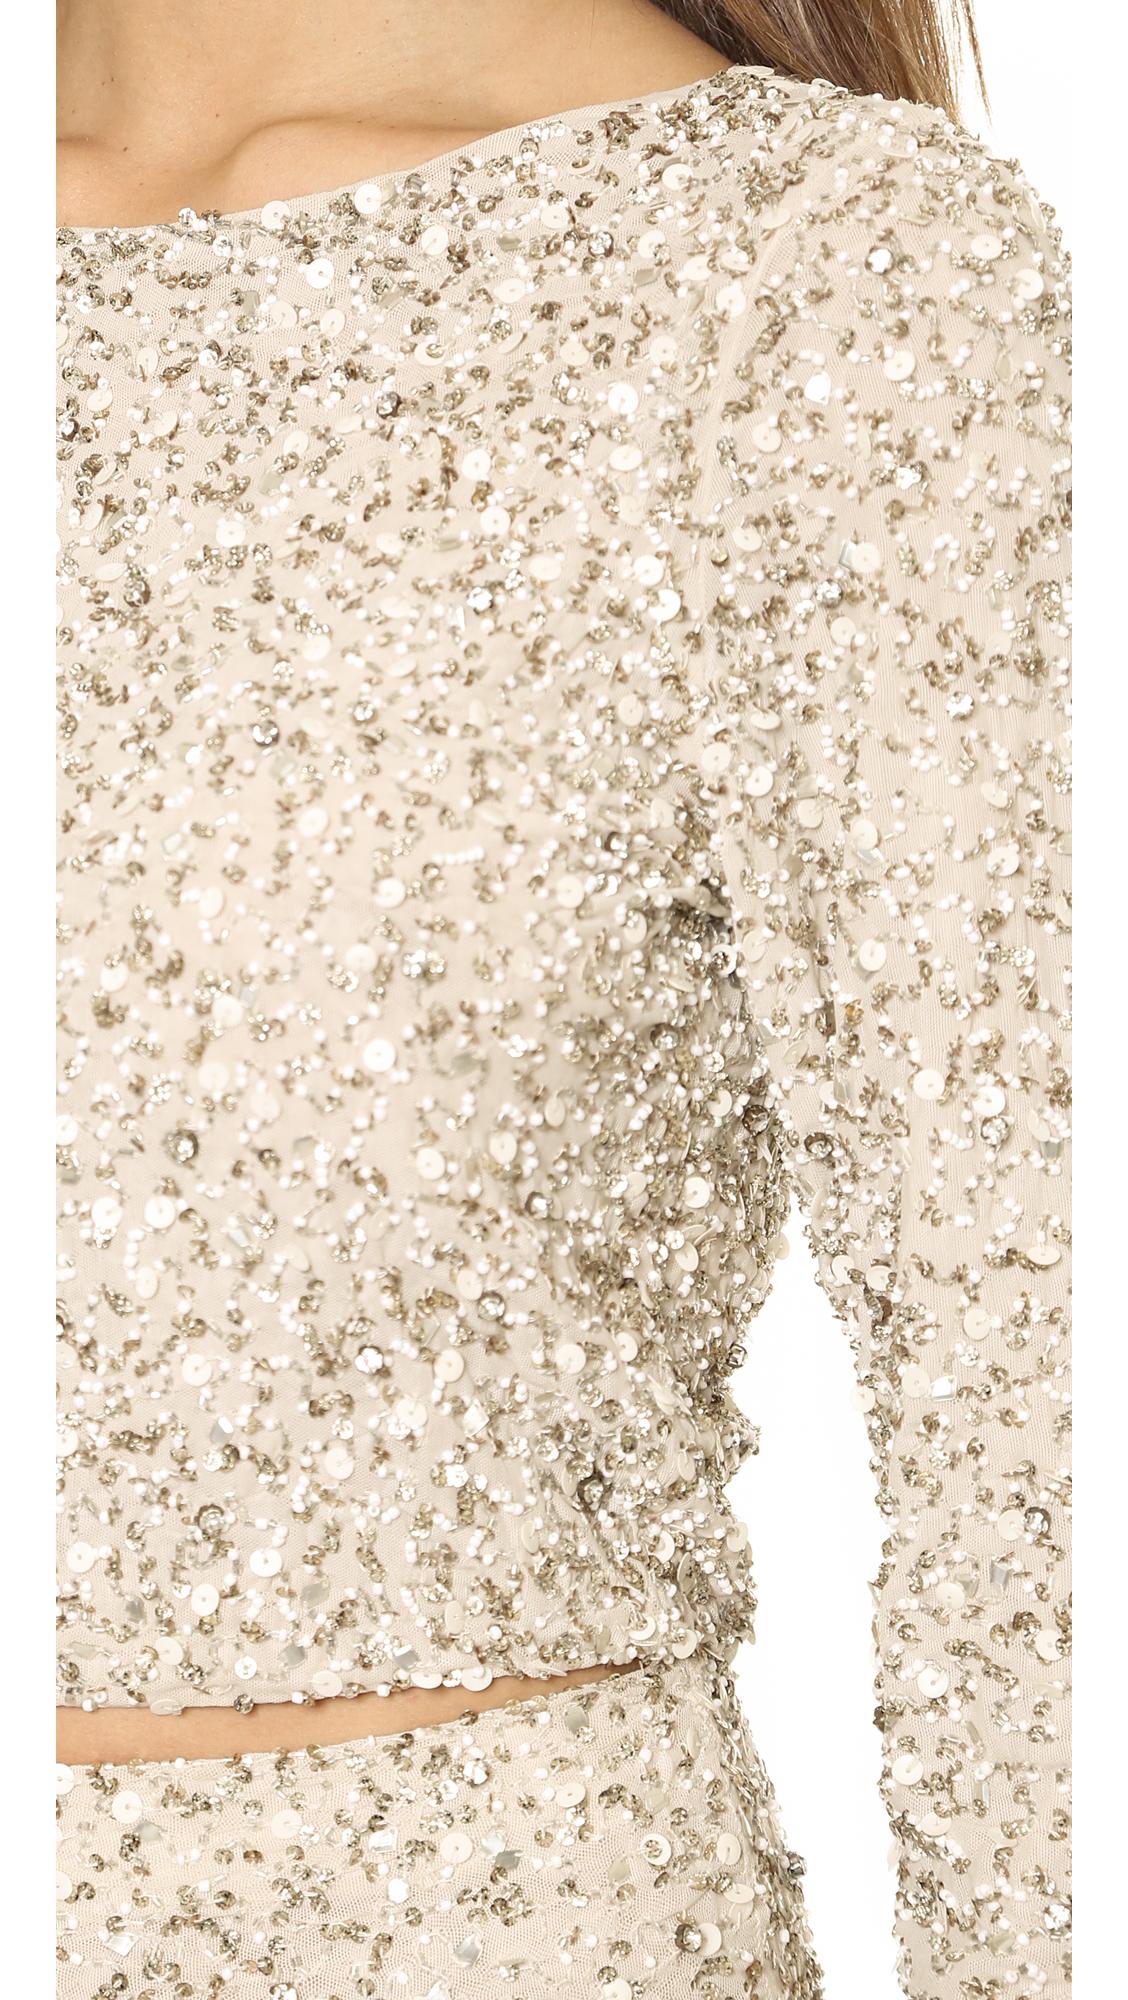 c590d1290e830c alice + olivia Lacey Embellished Crop Top